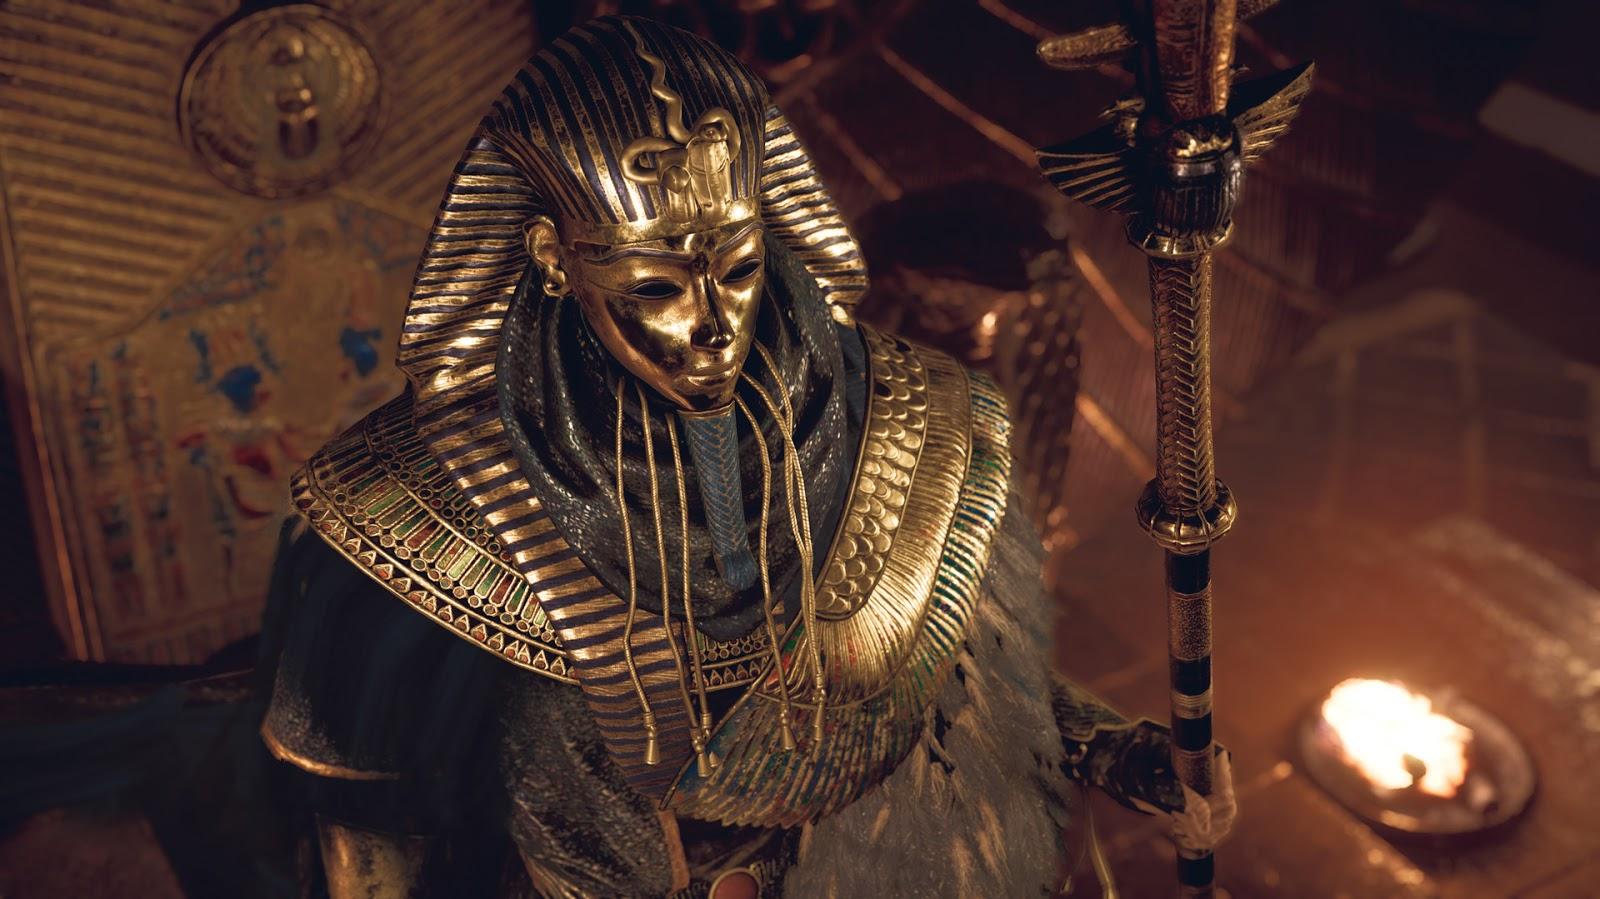 Assassin's Creed Origins The Curse Of The Pharaohs PC ESPAÑOL + Crackfix (CODEX) + REPACK 11 DVD5 (JPW) 4